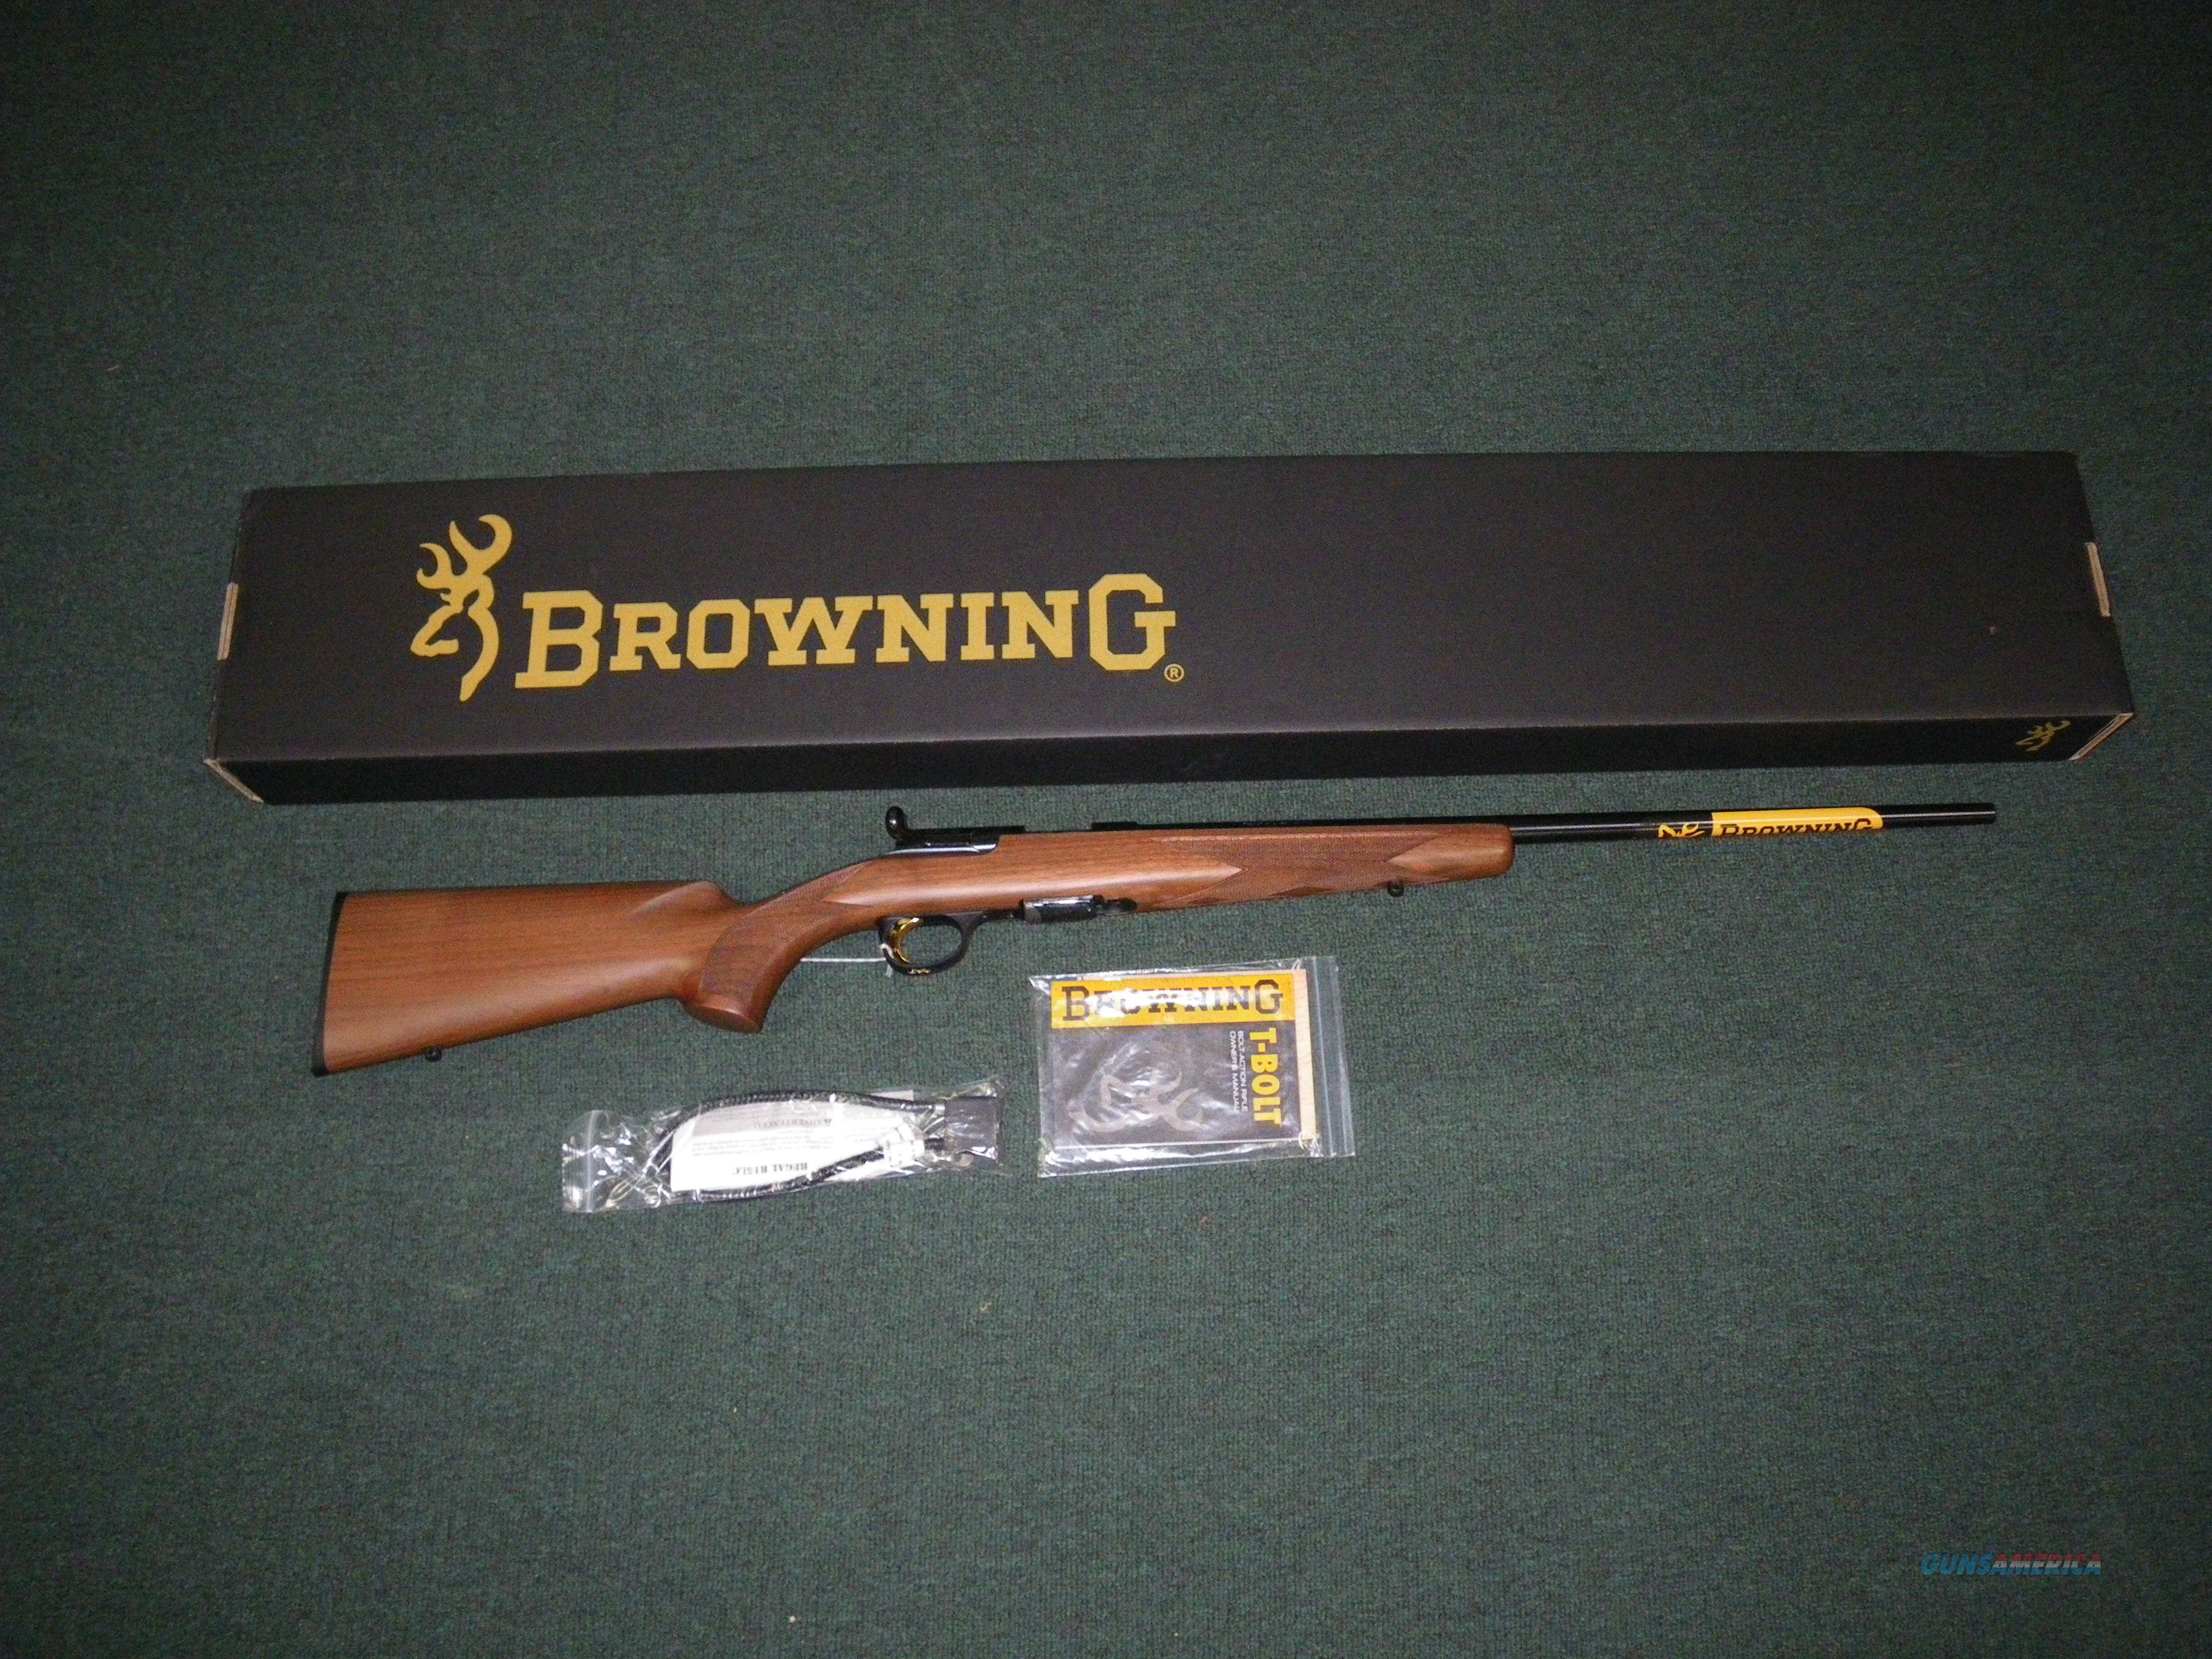 "Browning T-Bolt Sporter Wood 17 HMR 22"" #025175270  Guns > Rifles > Browning Rifles > Bolt Action > Hunting > Blue"